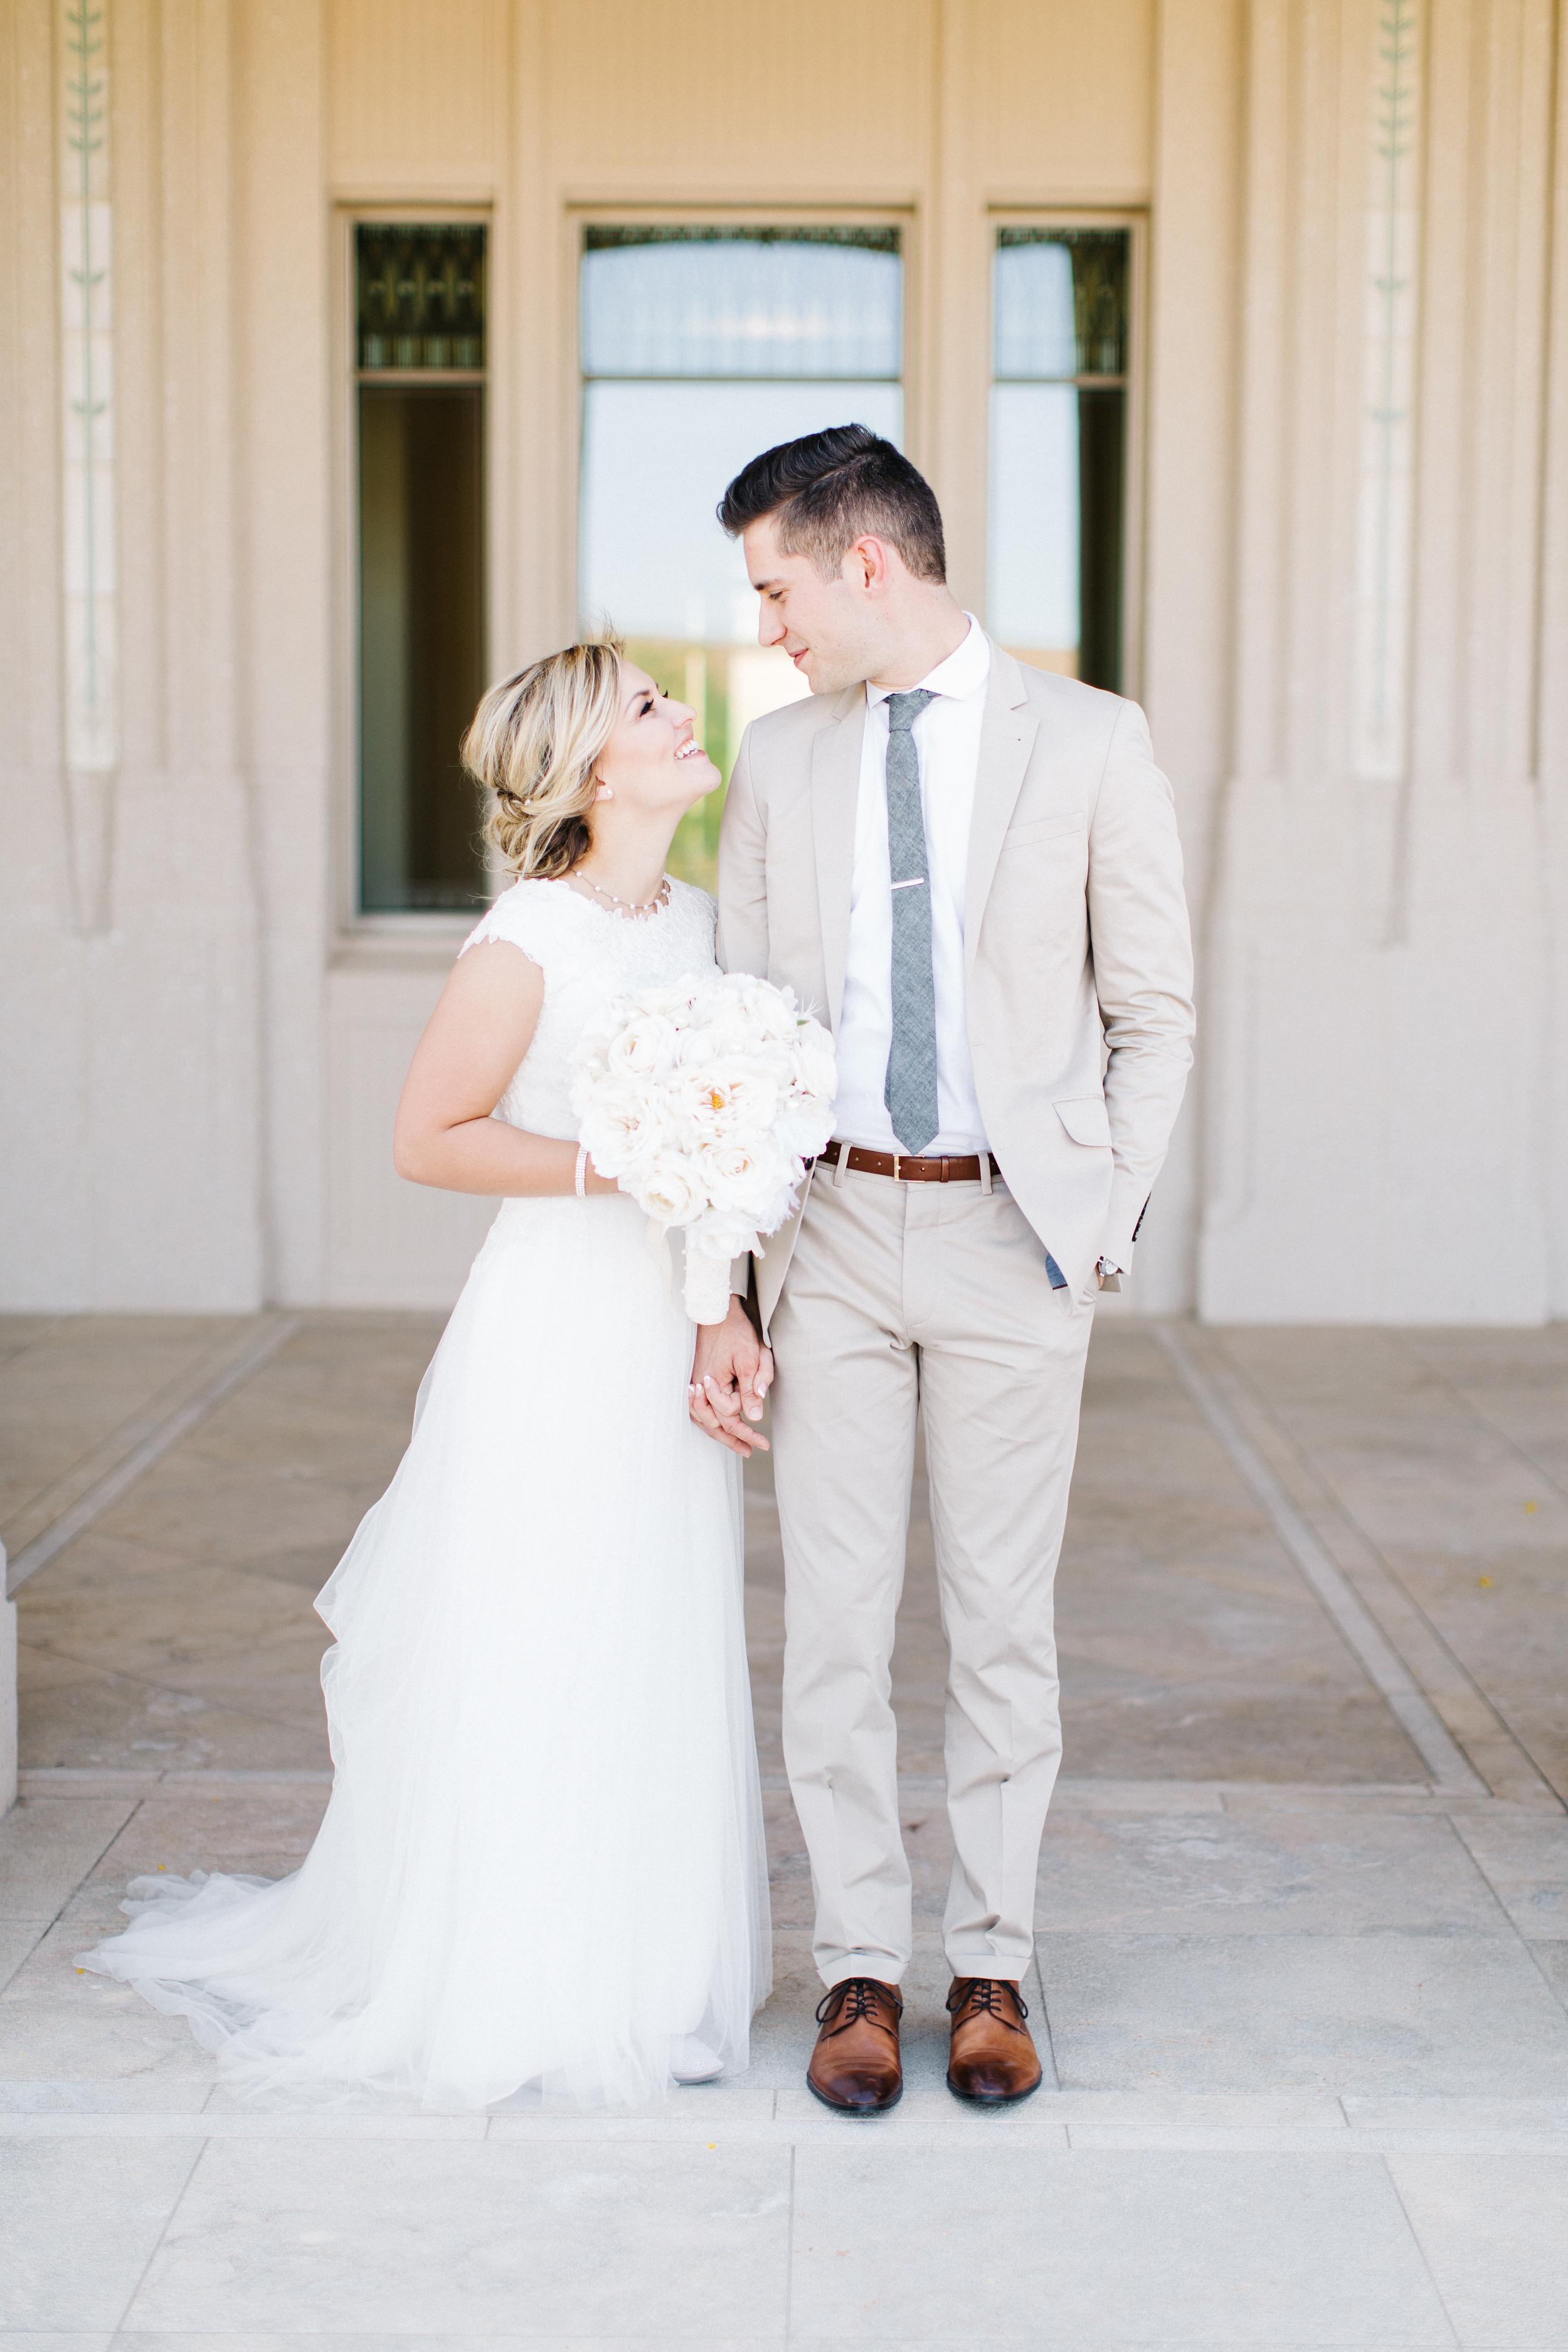 KennedyWyatt_WeddingDay-115.jpg